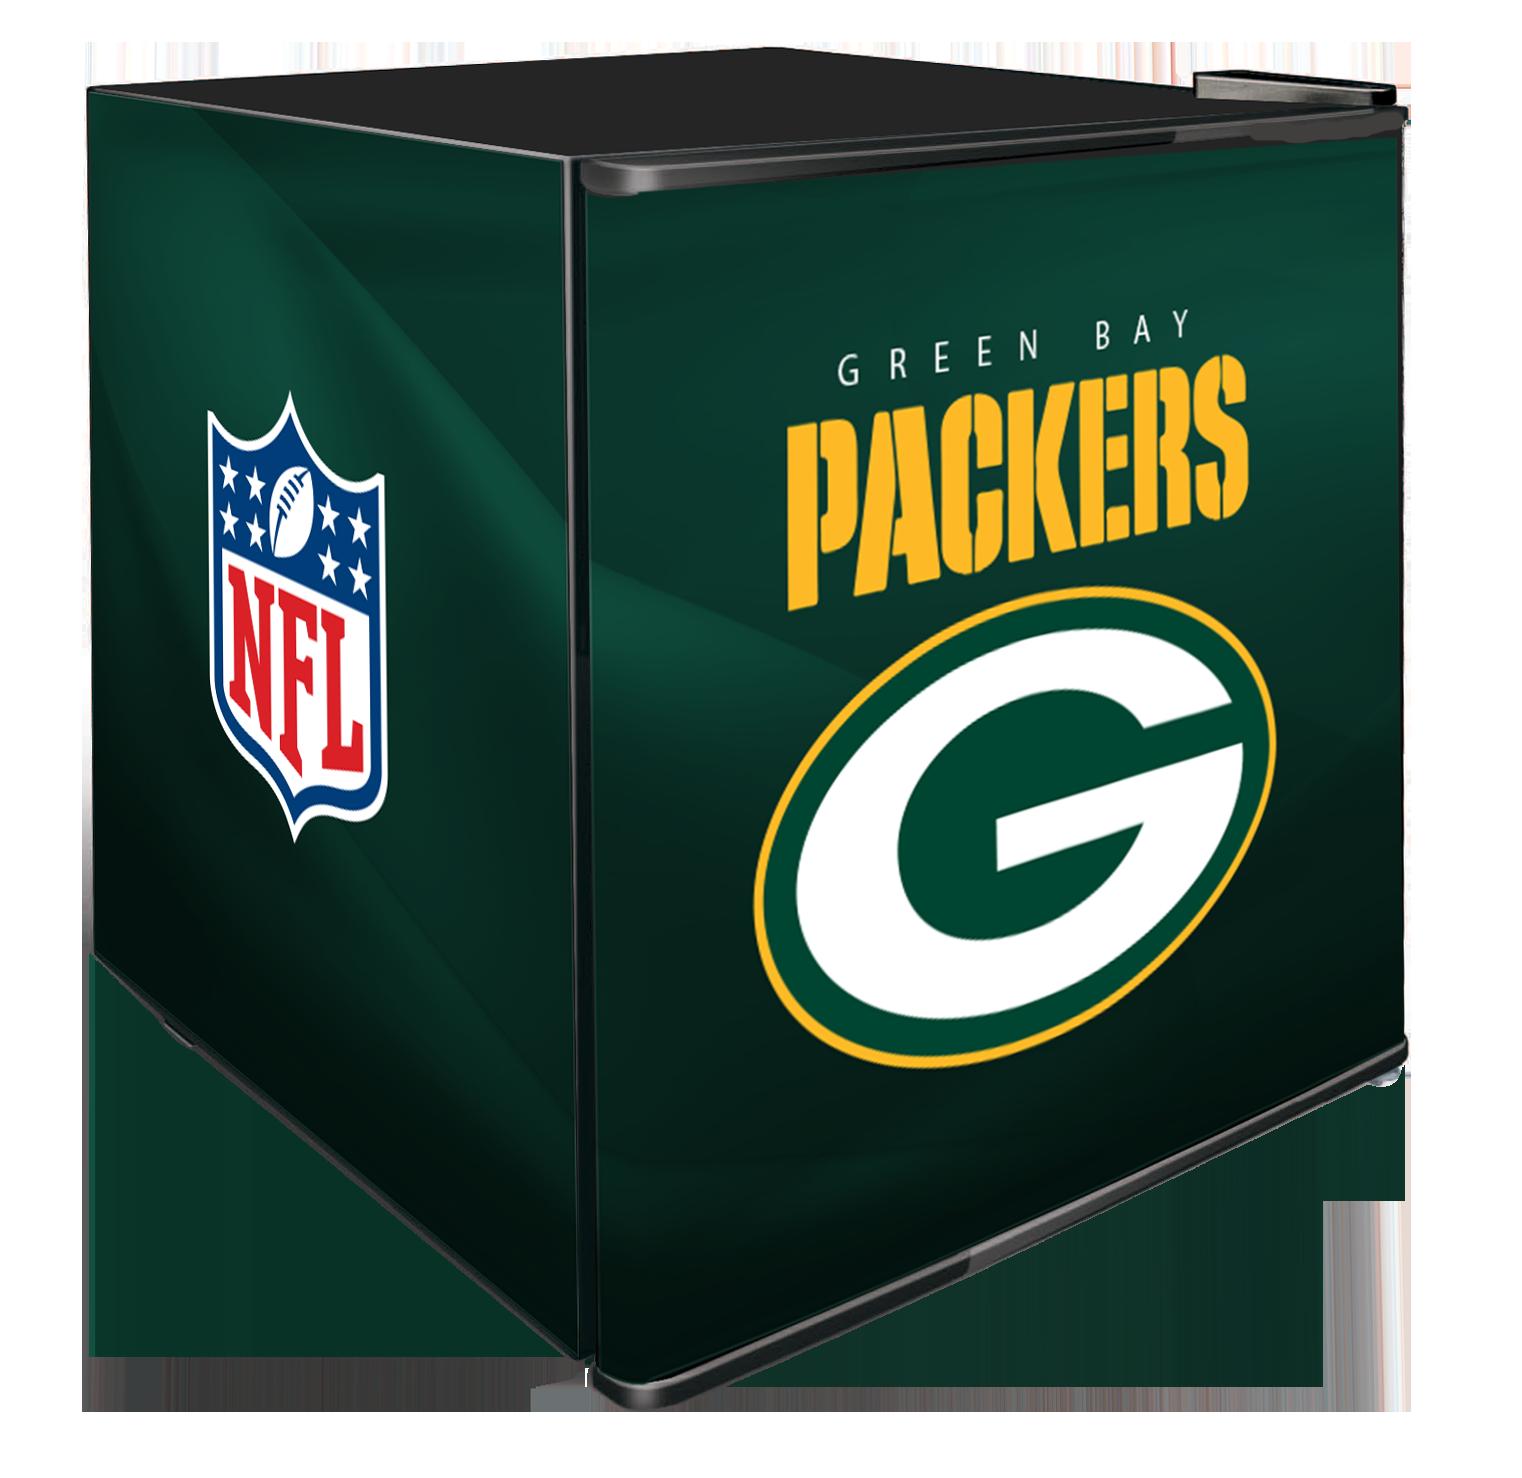 NFL Solid Door Refrigerated Beverage Center 1.8 cu ft- Green Bay Packers